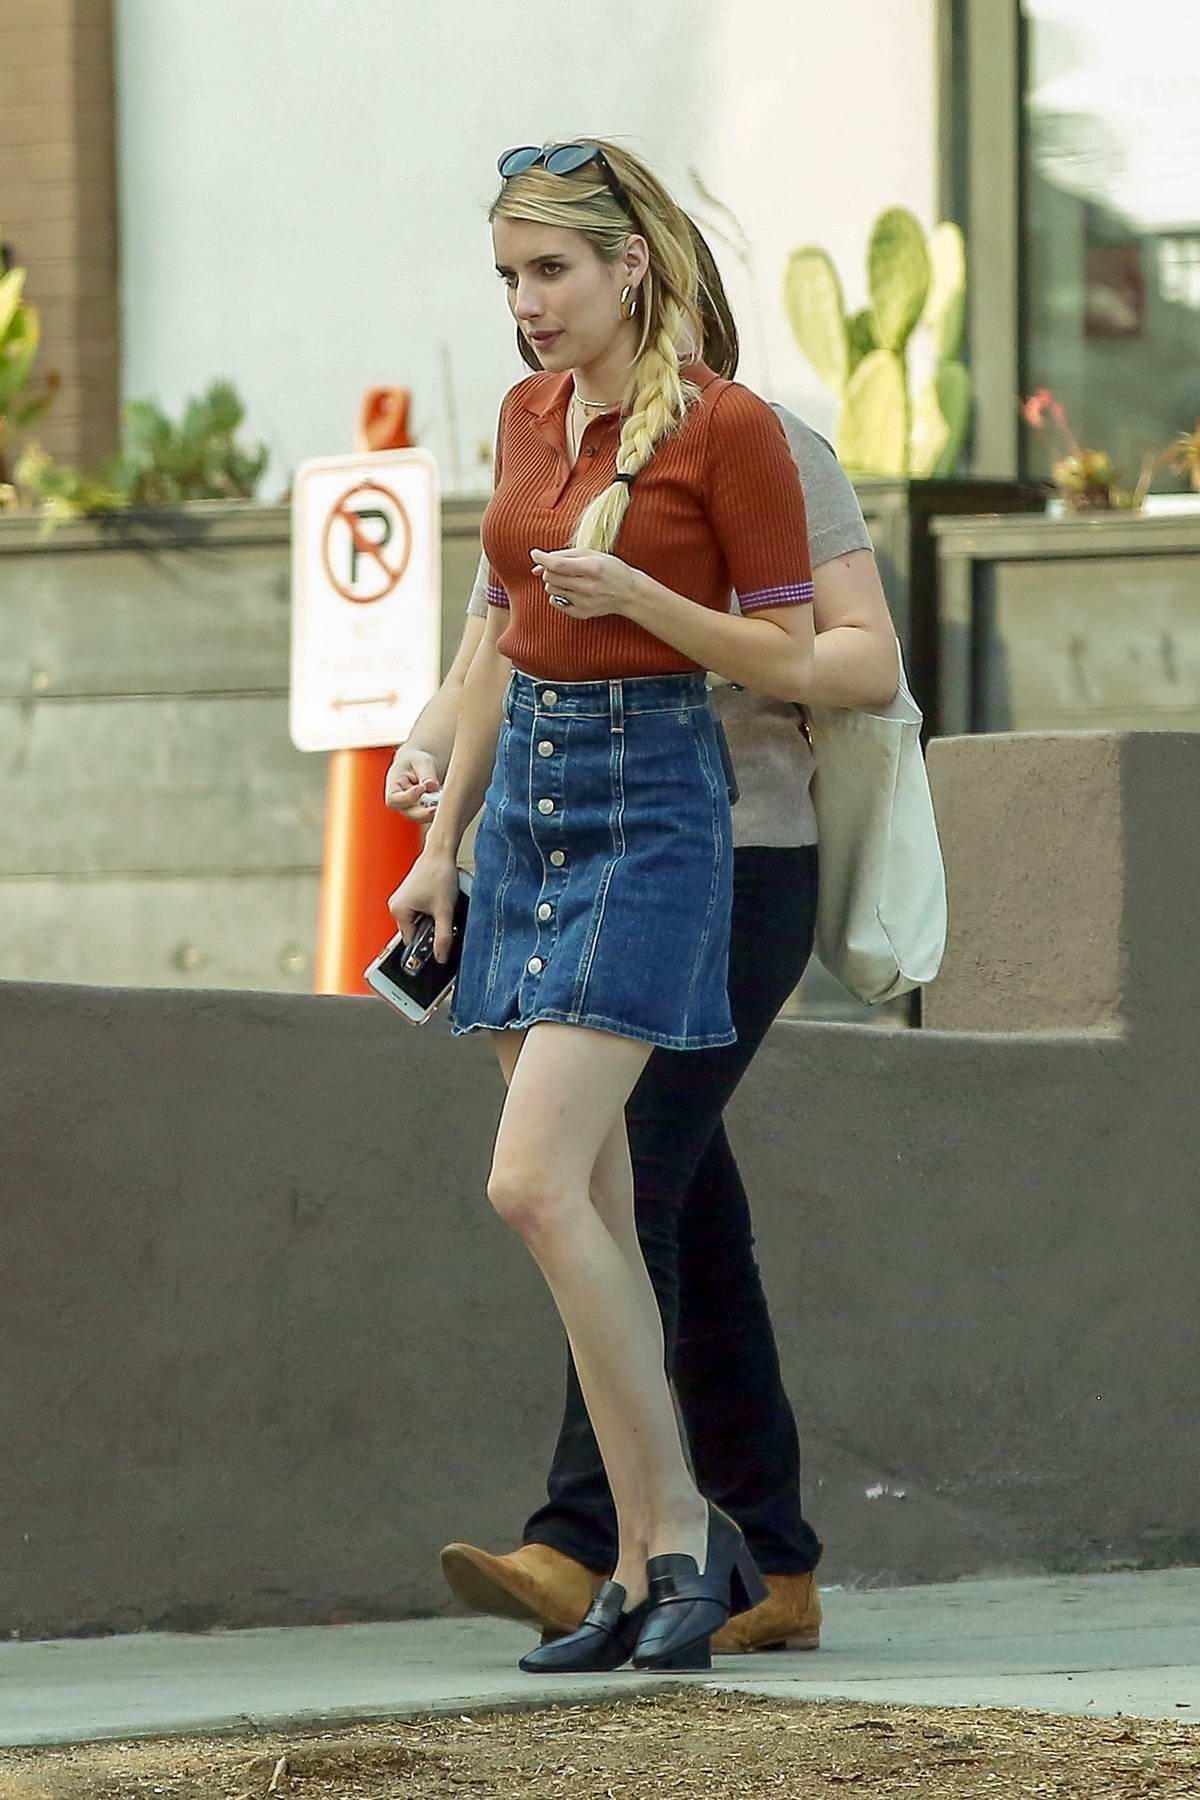 photo Emma roberts cute street style